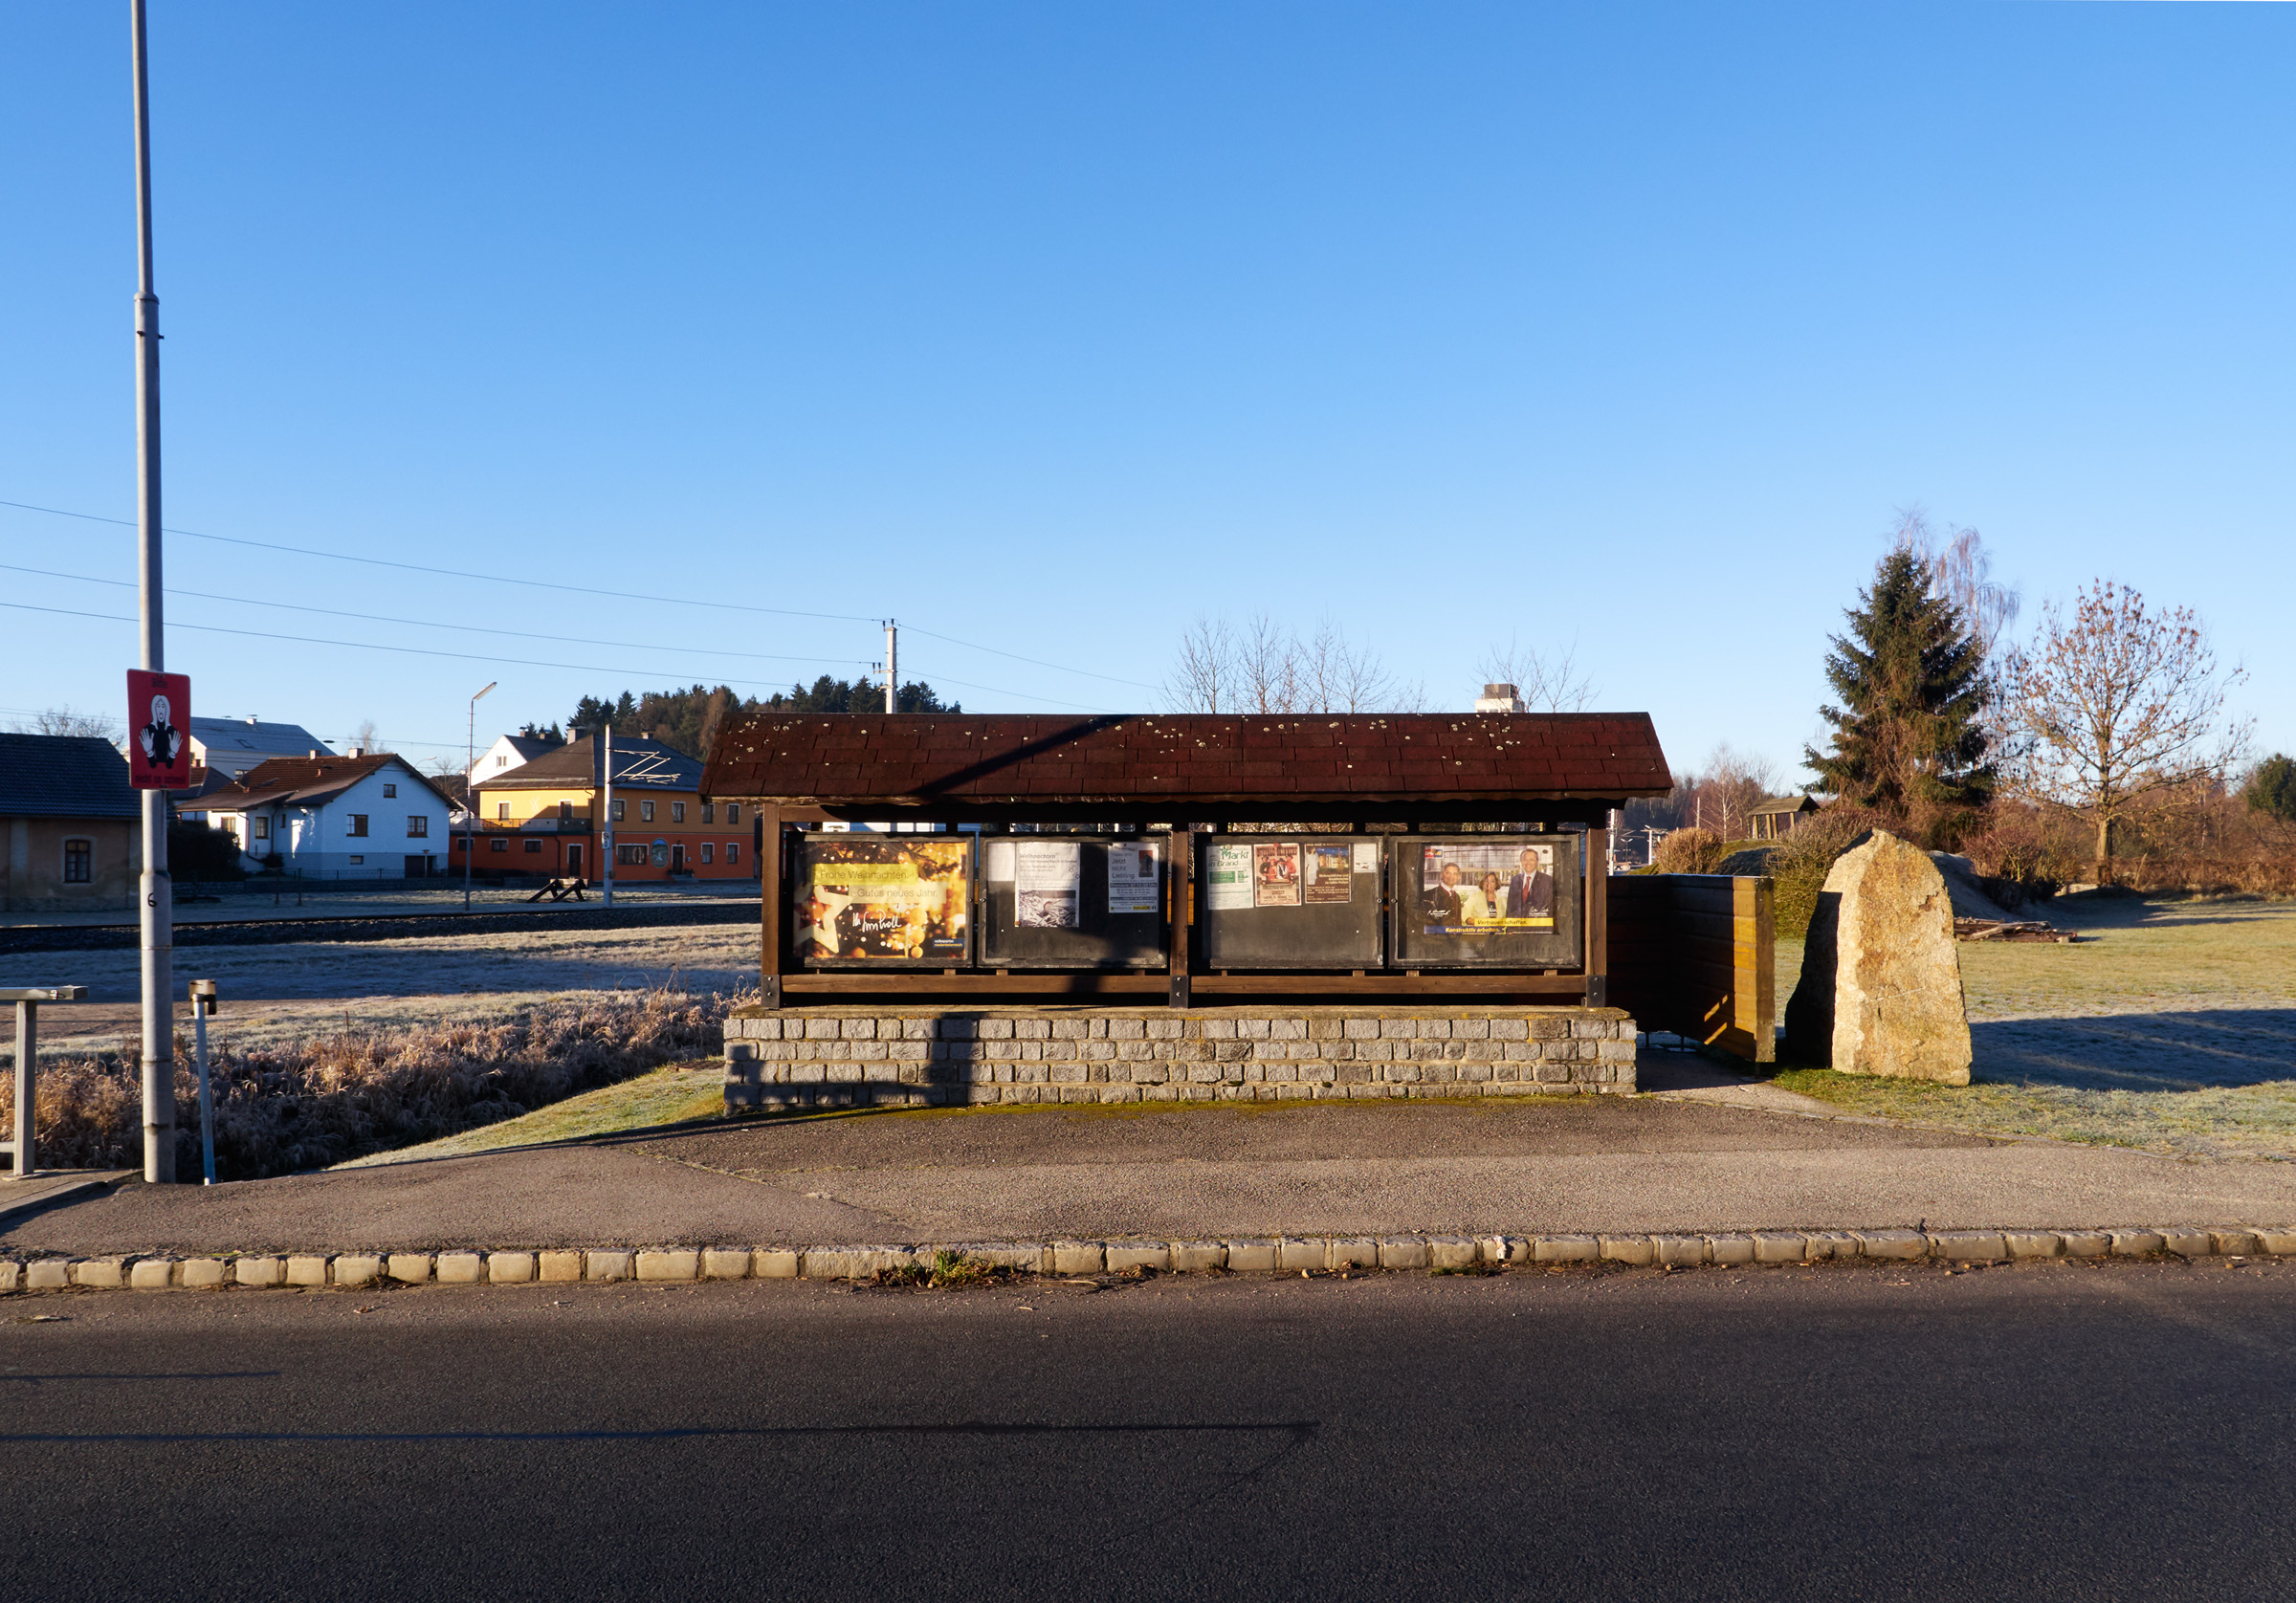 Pürbach weit 2013-12-16.jpg